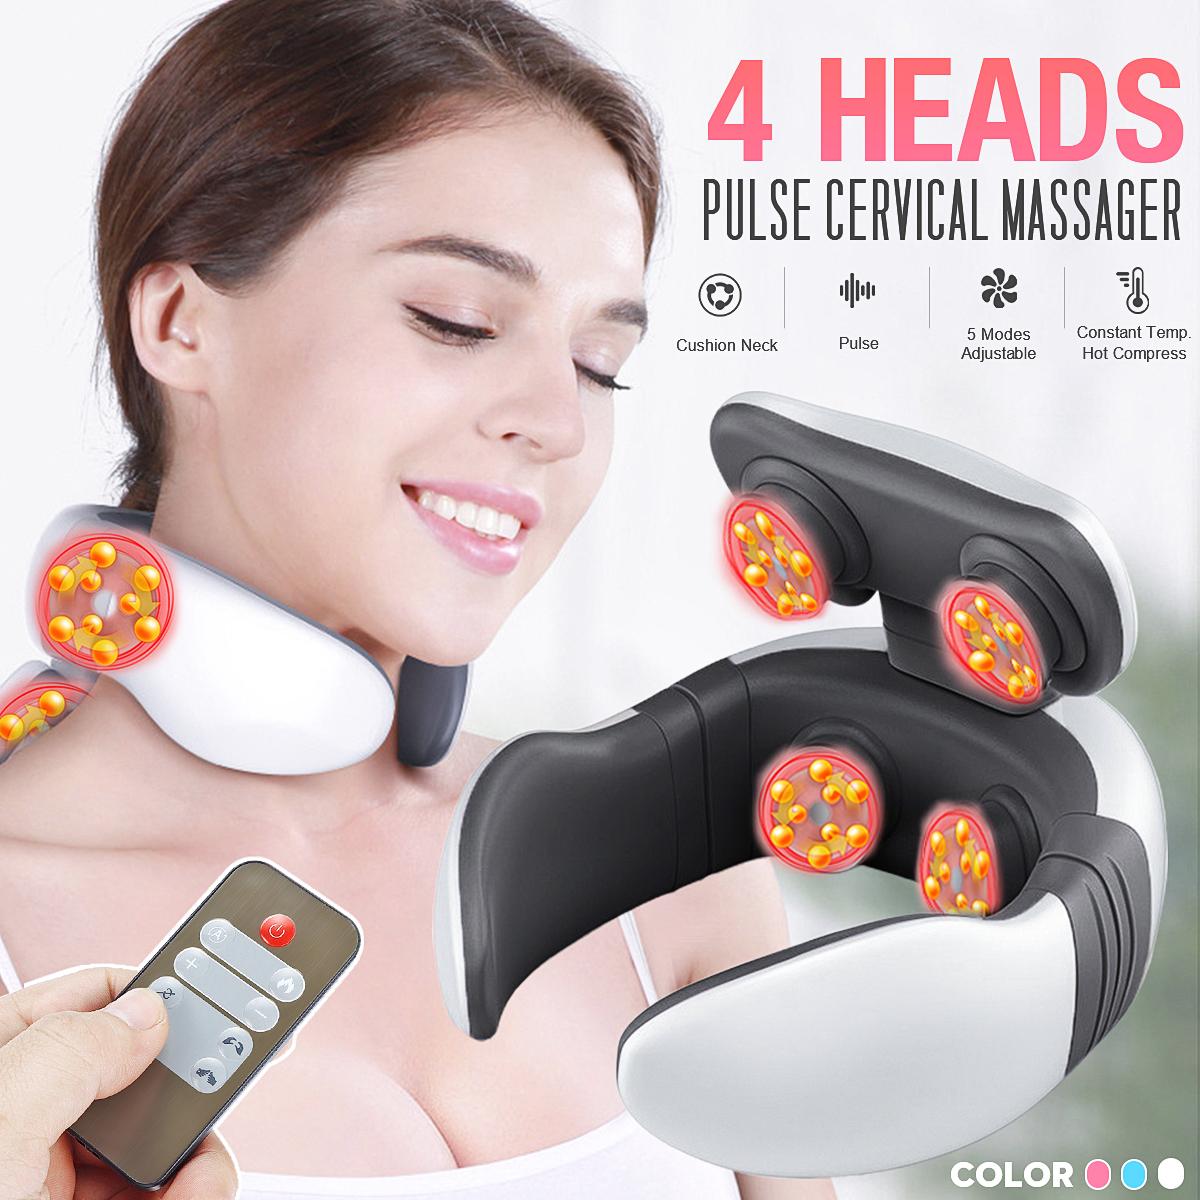 Rechargeable 4 Head Smart Neck Massager W/ Remote Control Neck Shoulder Pulse Electric Massager Promote Blood Circulation